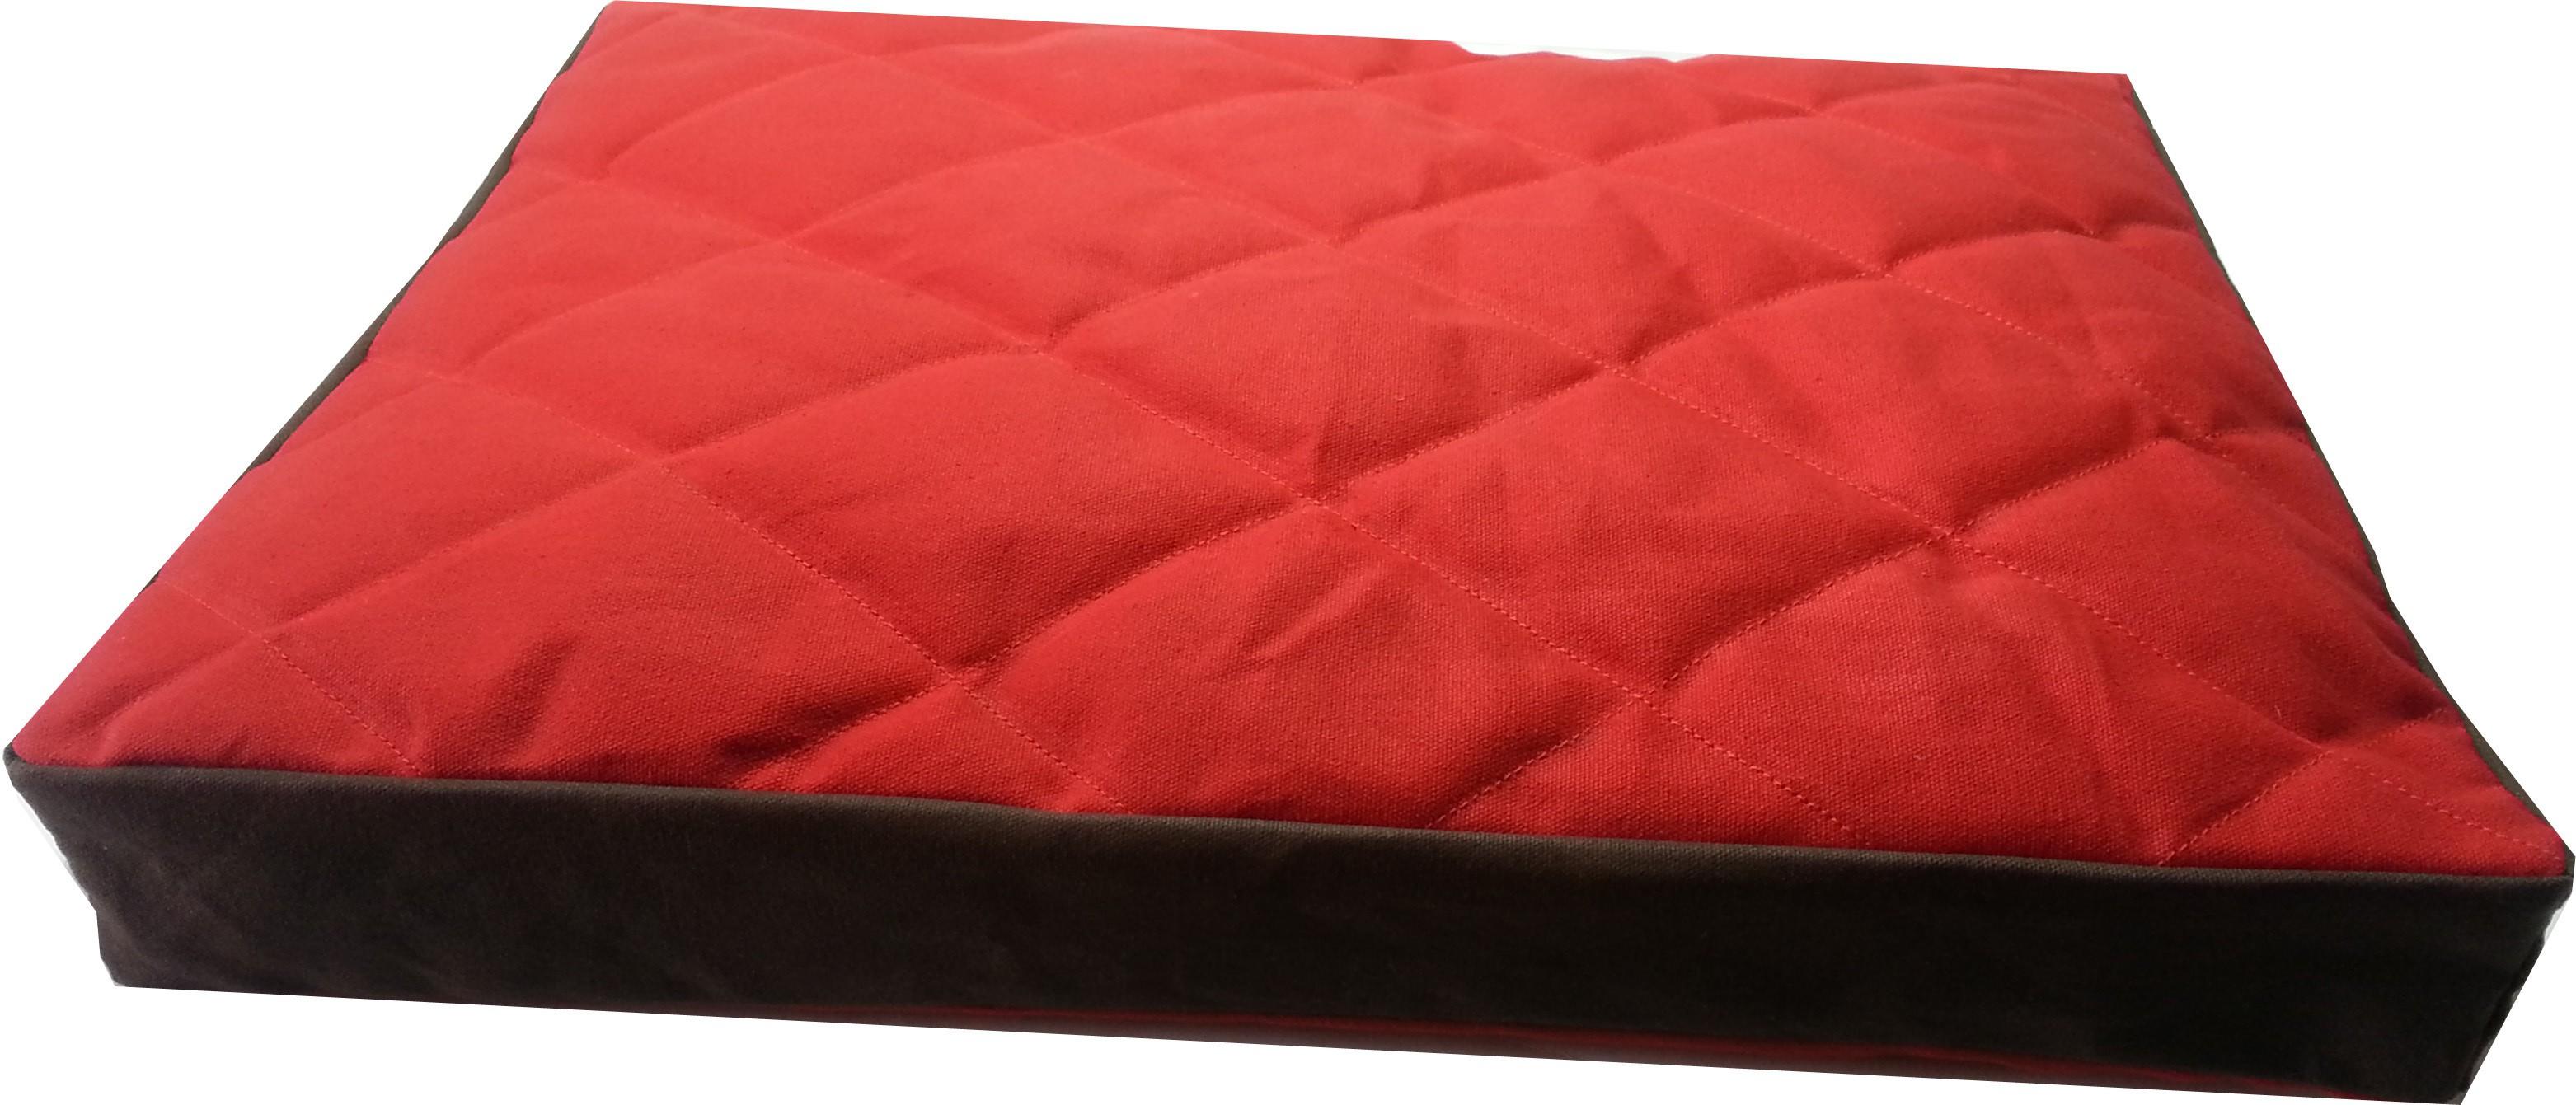 View Snug Hug 121 M Pet Bed(Red / Chocolate, Tan / Navy) Furniture (Snug Hug)